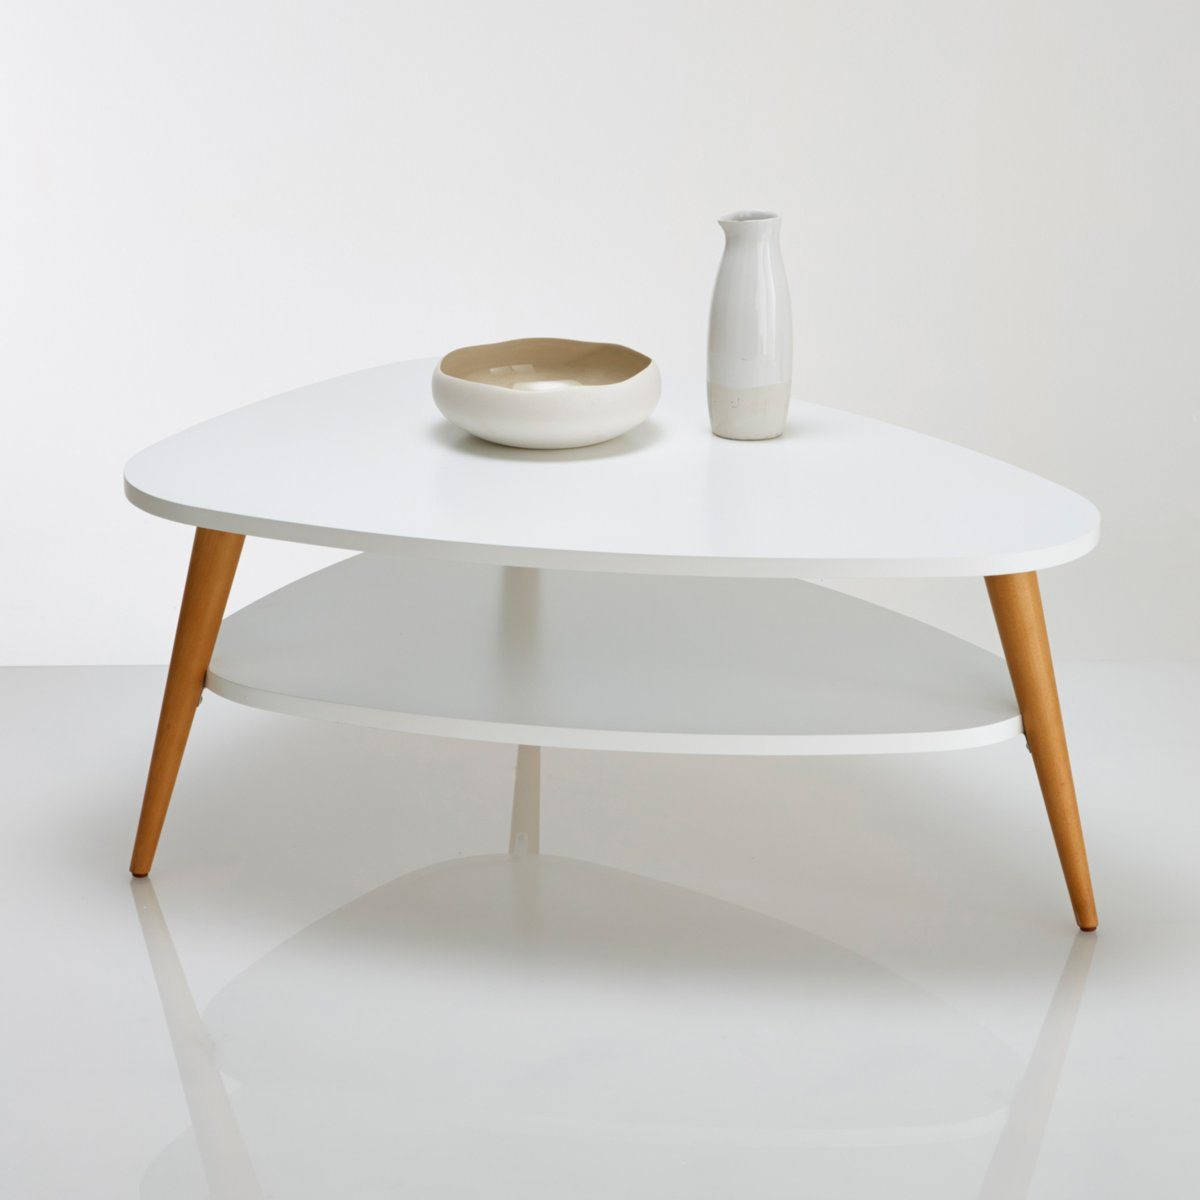 Gifi table basse scandinave - emberizaone.fr